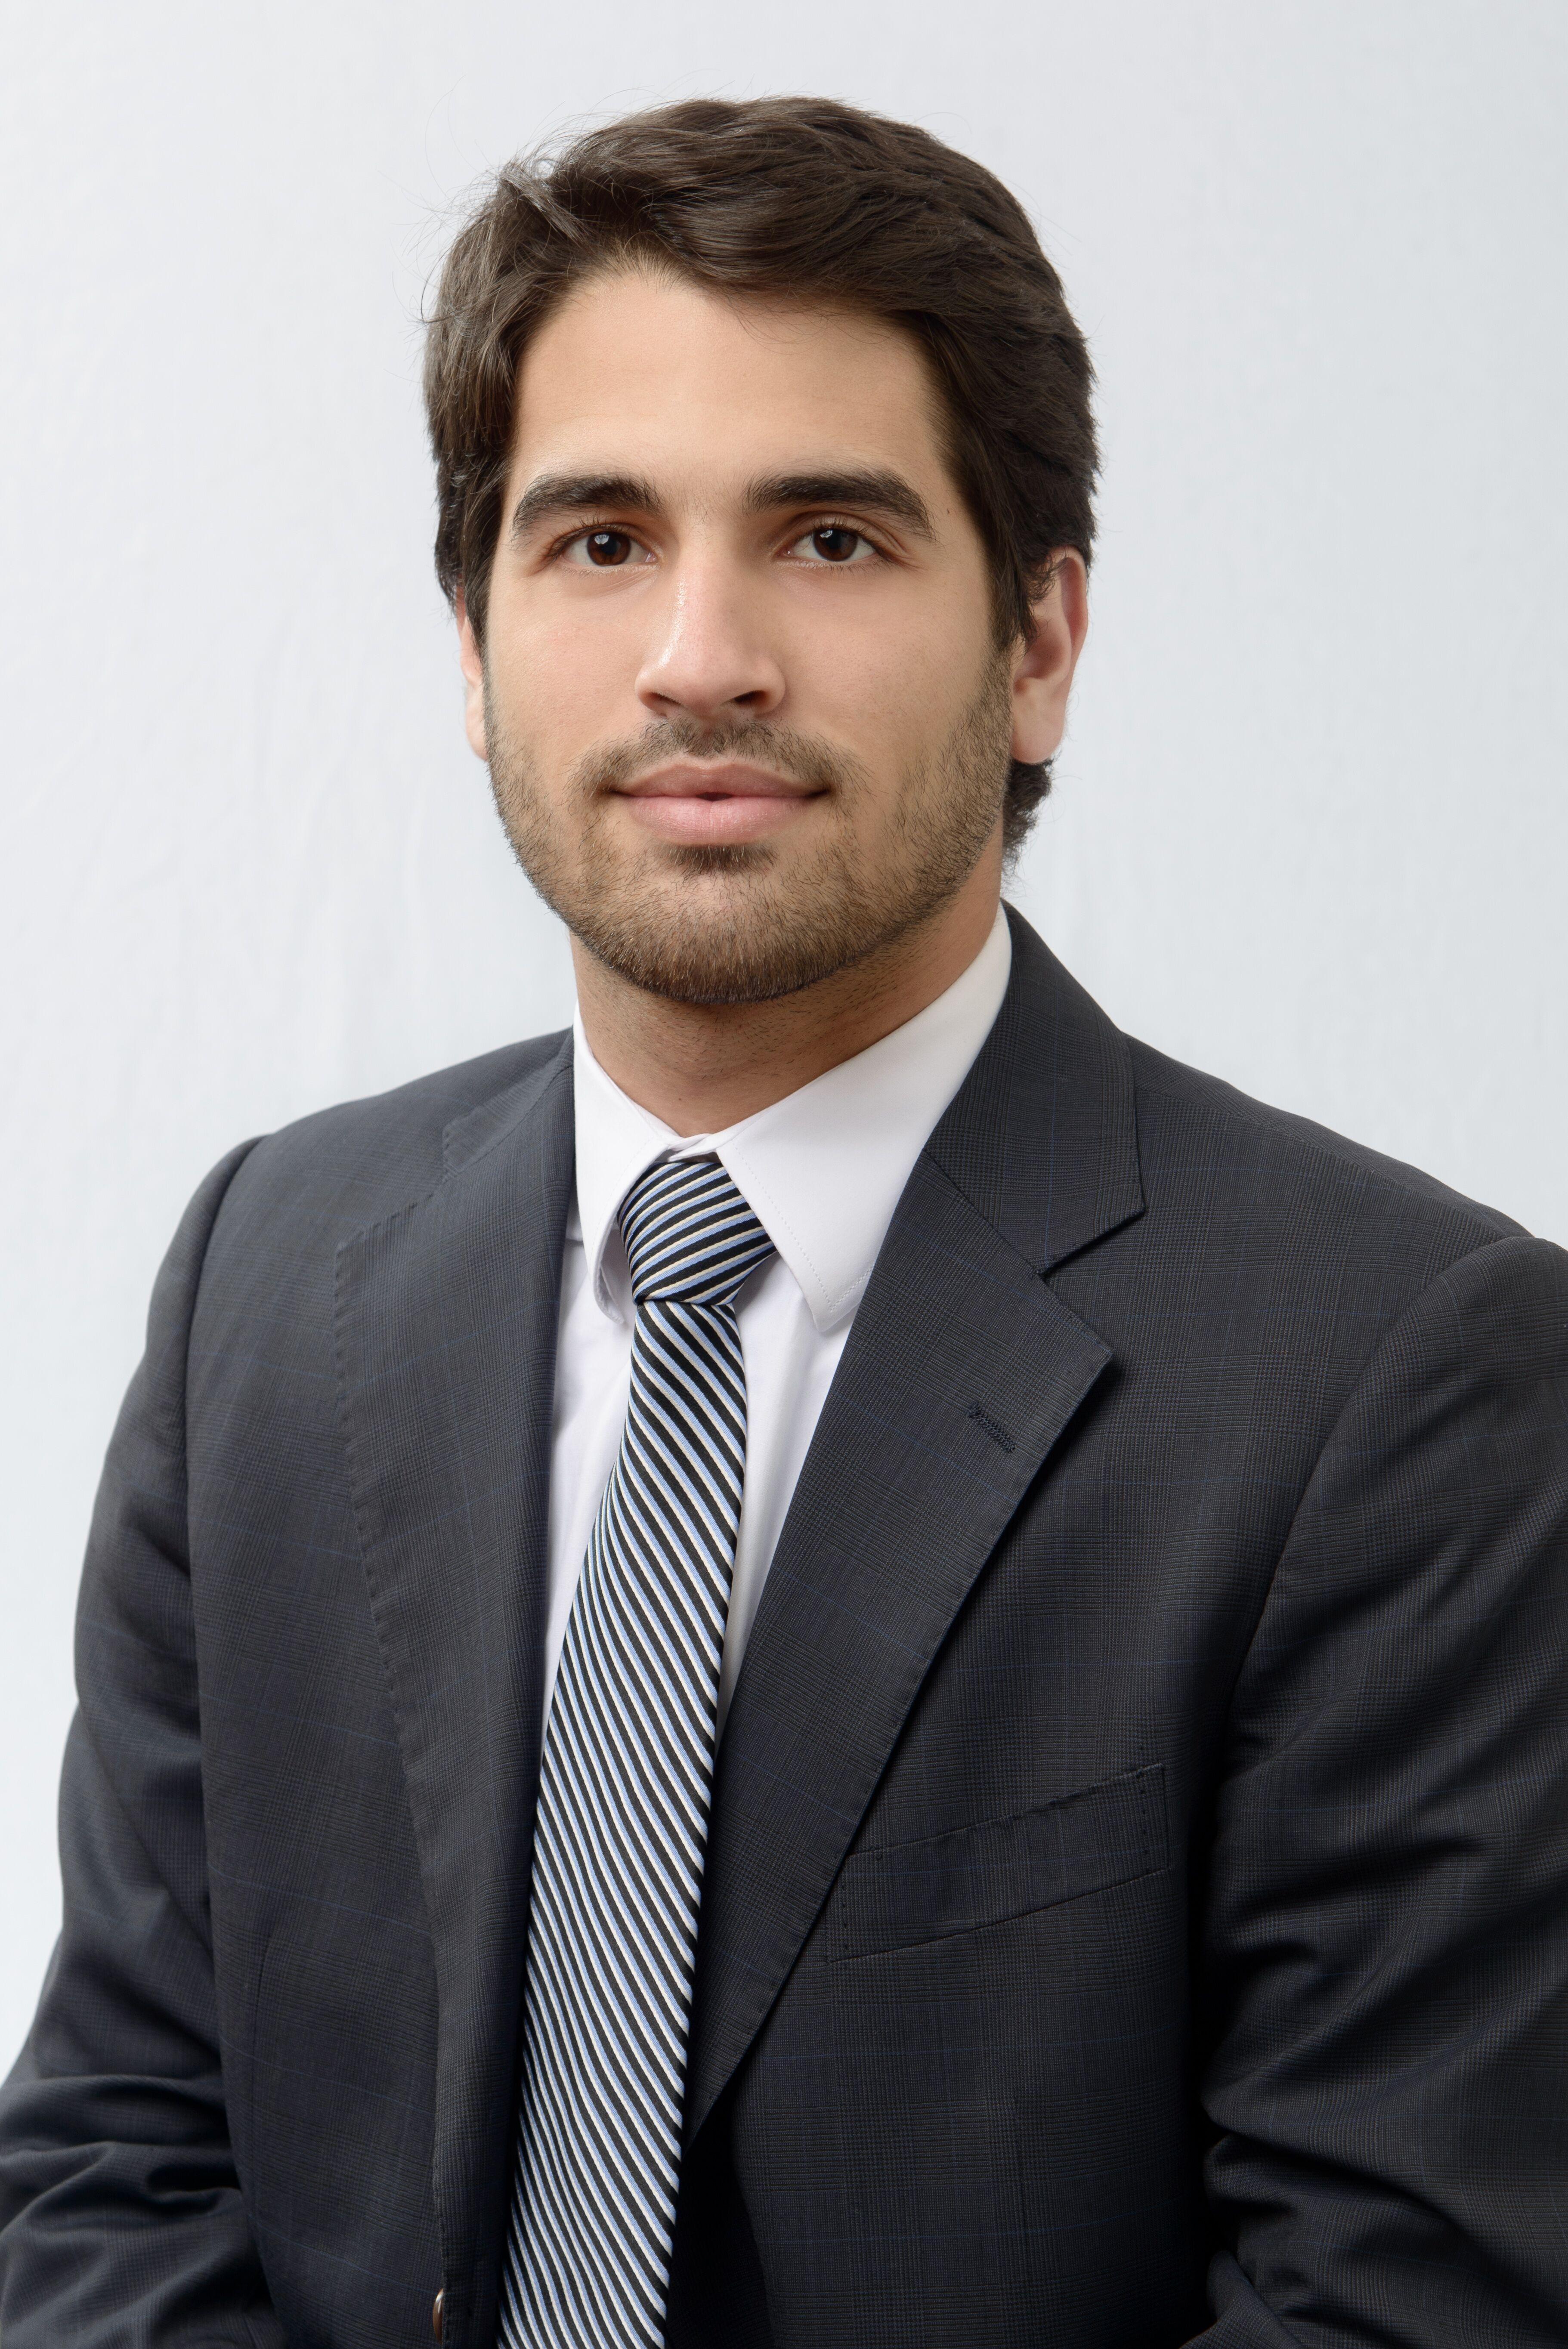 Alejandro Lama Morel